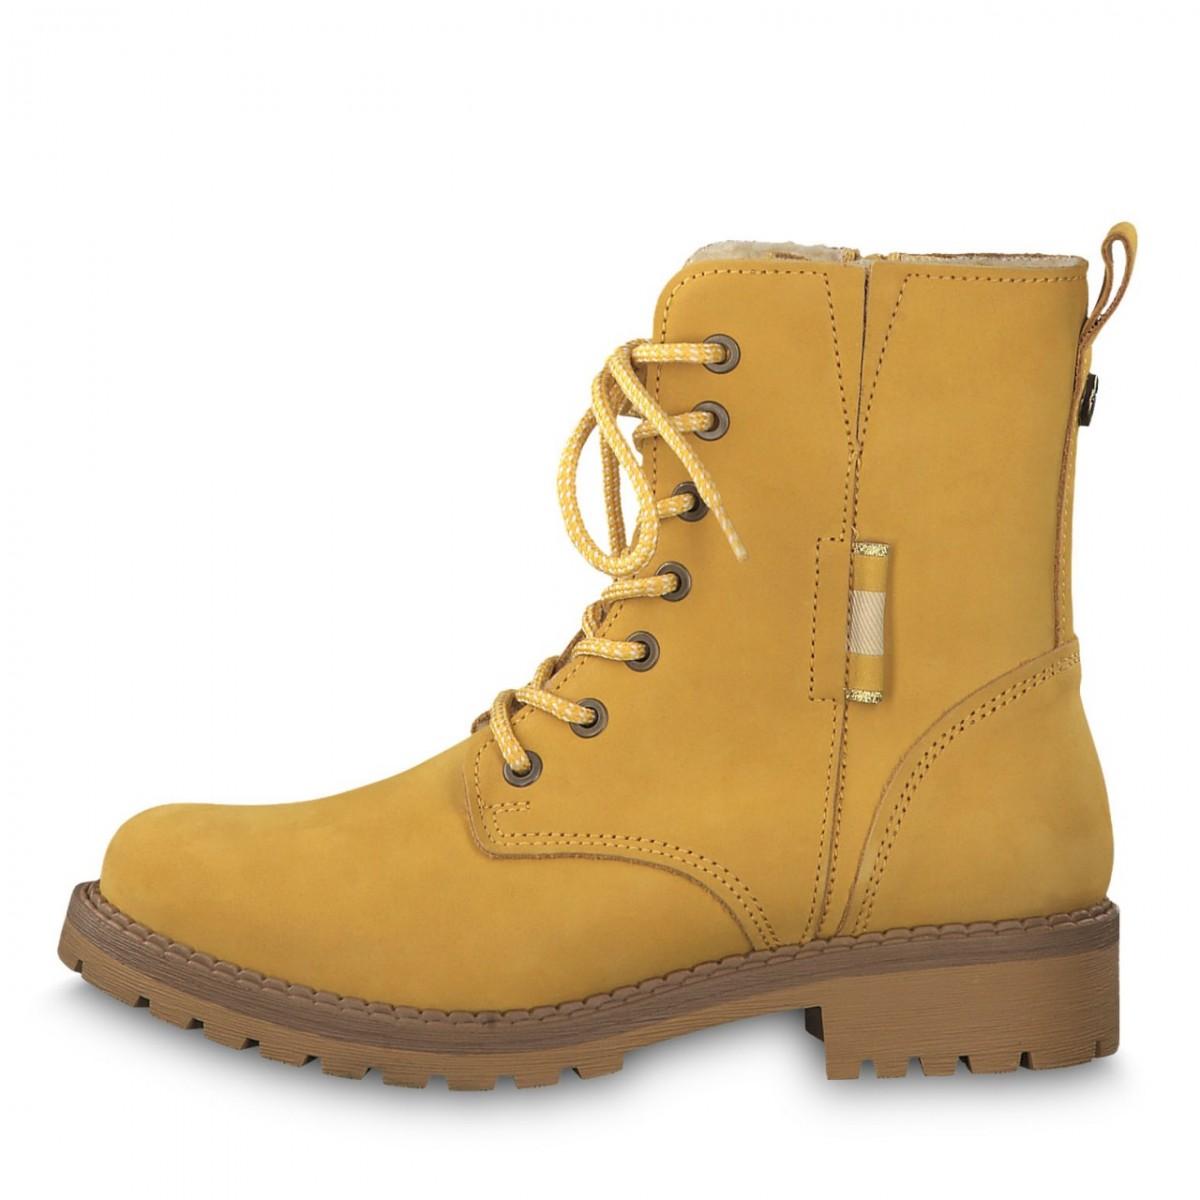 Details zu Tamaris Schuhe gelb Nubuk Leder Warmfutter komfort Damen